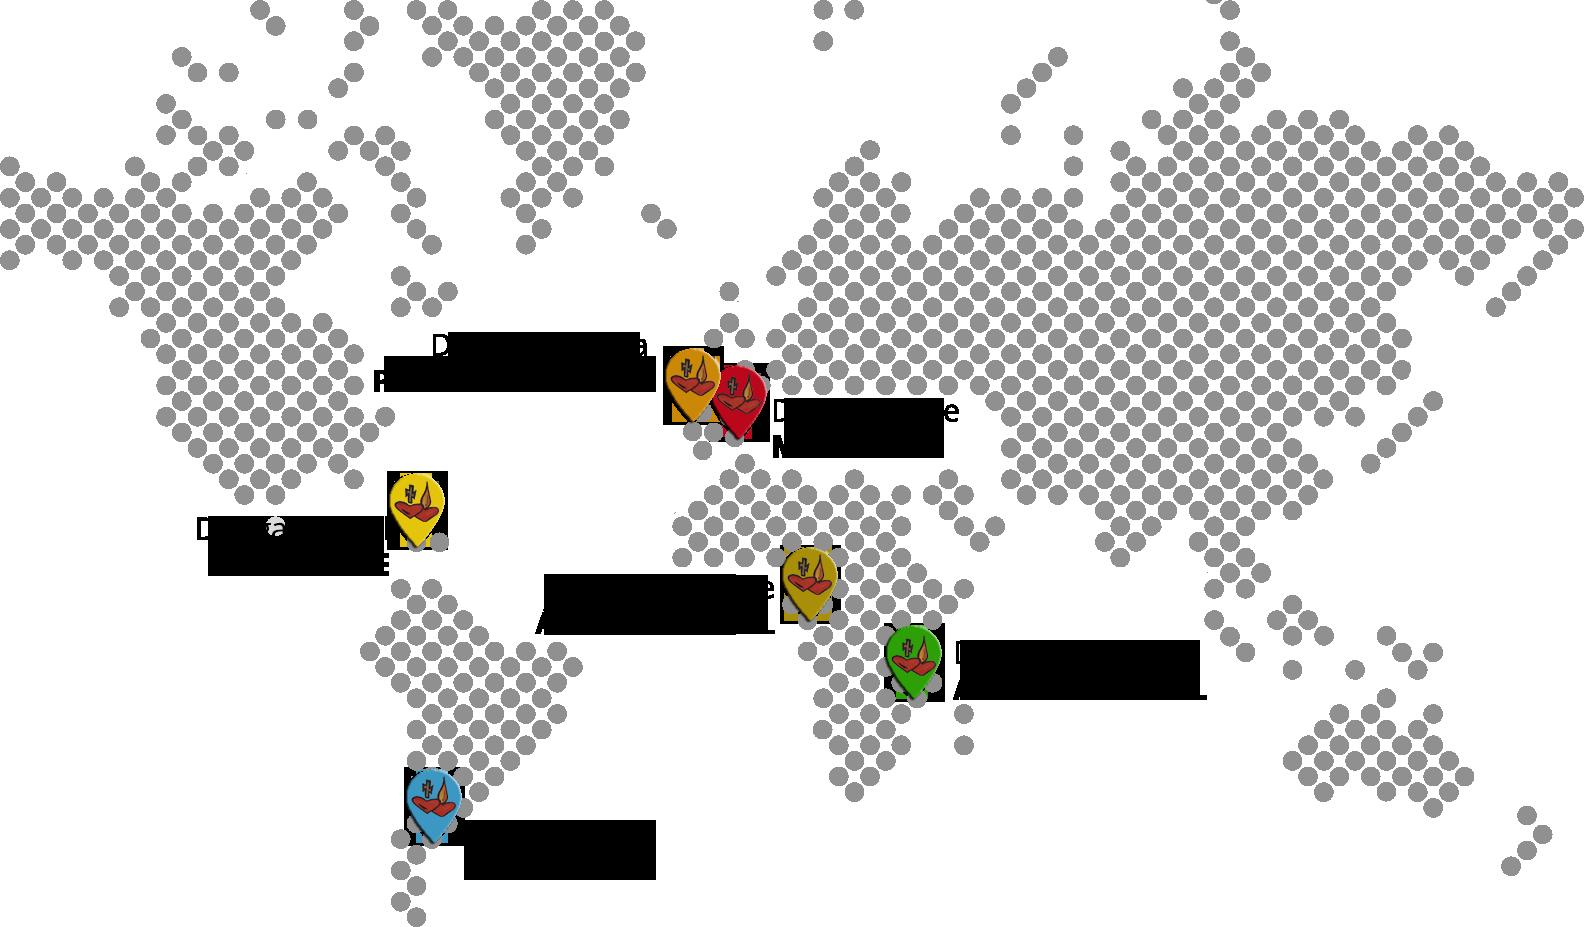 carisma_lugares_mundo